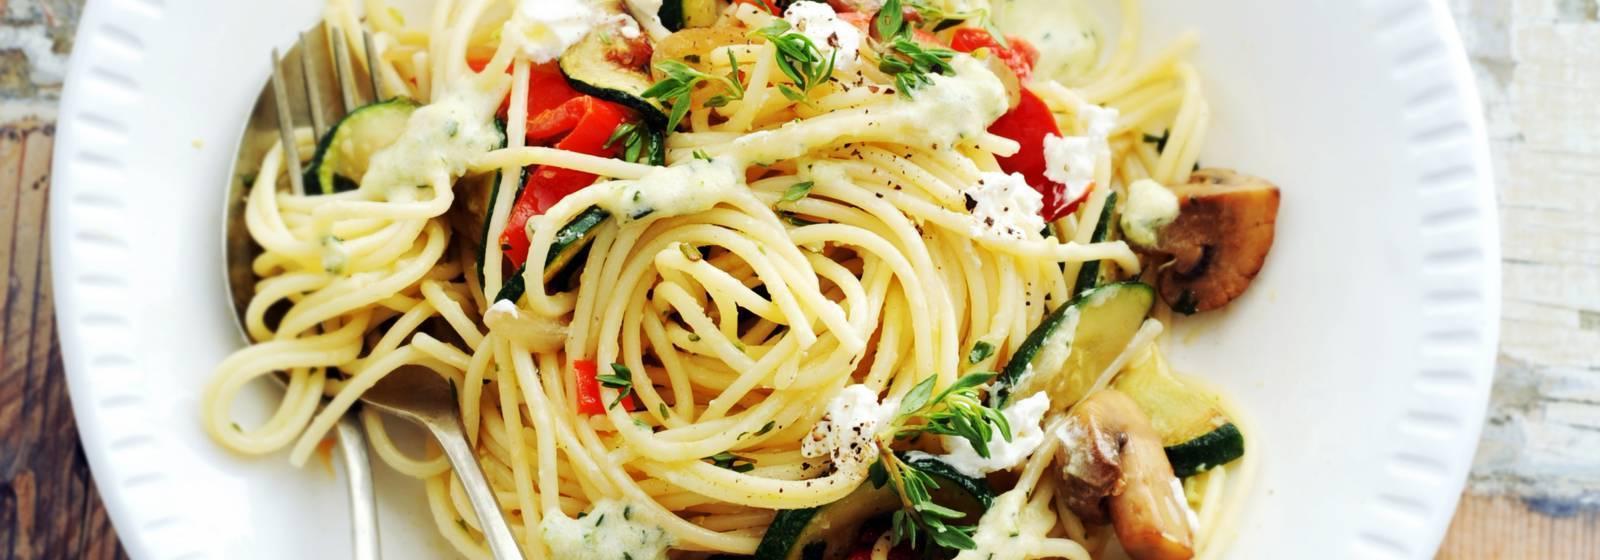 Spaghetti with mushrooms and zucchini sauce